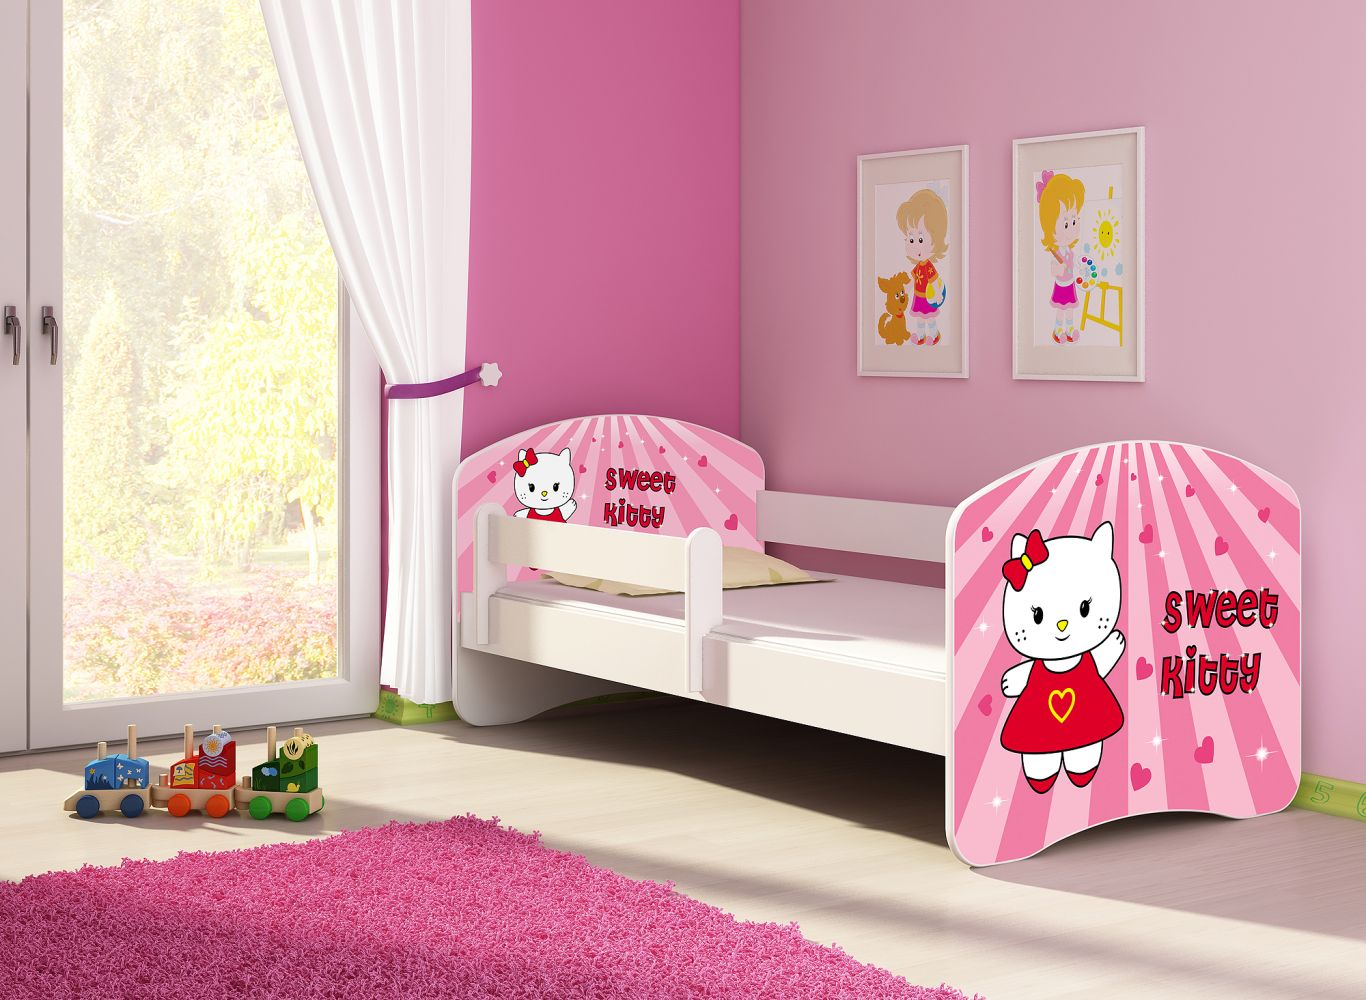 Clamaro 'Fantasia' Kinderbett 'Sweet Kitty' 80 x 160 cm inkl. Rausfallschutz, Matratze und Lattenrost Bild 1